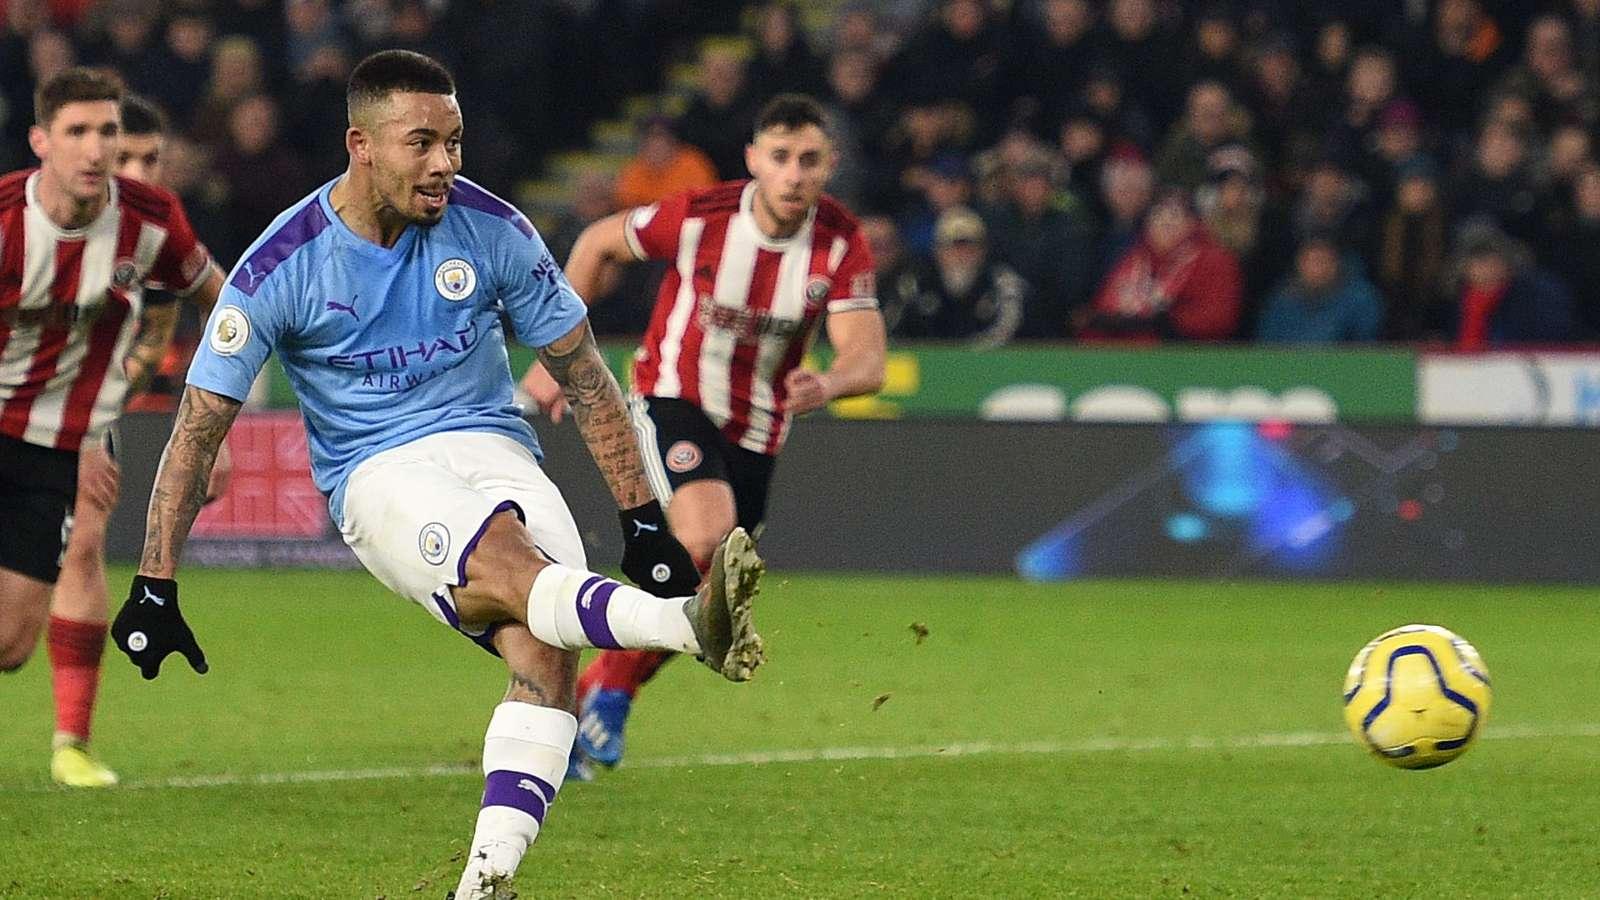 لیگ برتر-شفیلد یونایتد-منچسترسیتی-سیتیزنها-Brazil-Premier League-Citizens-Manchester City